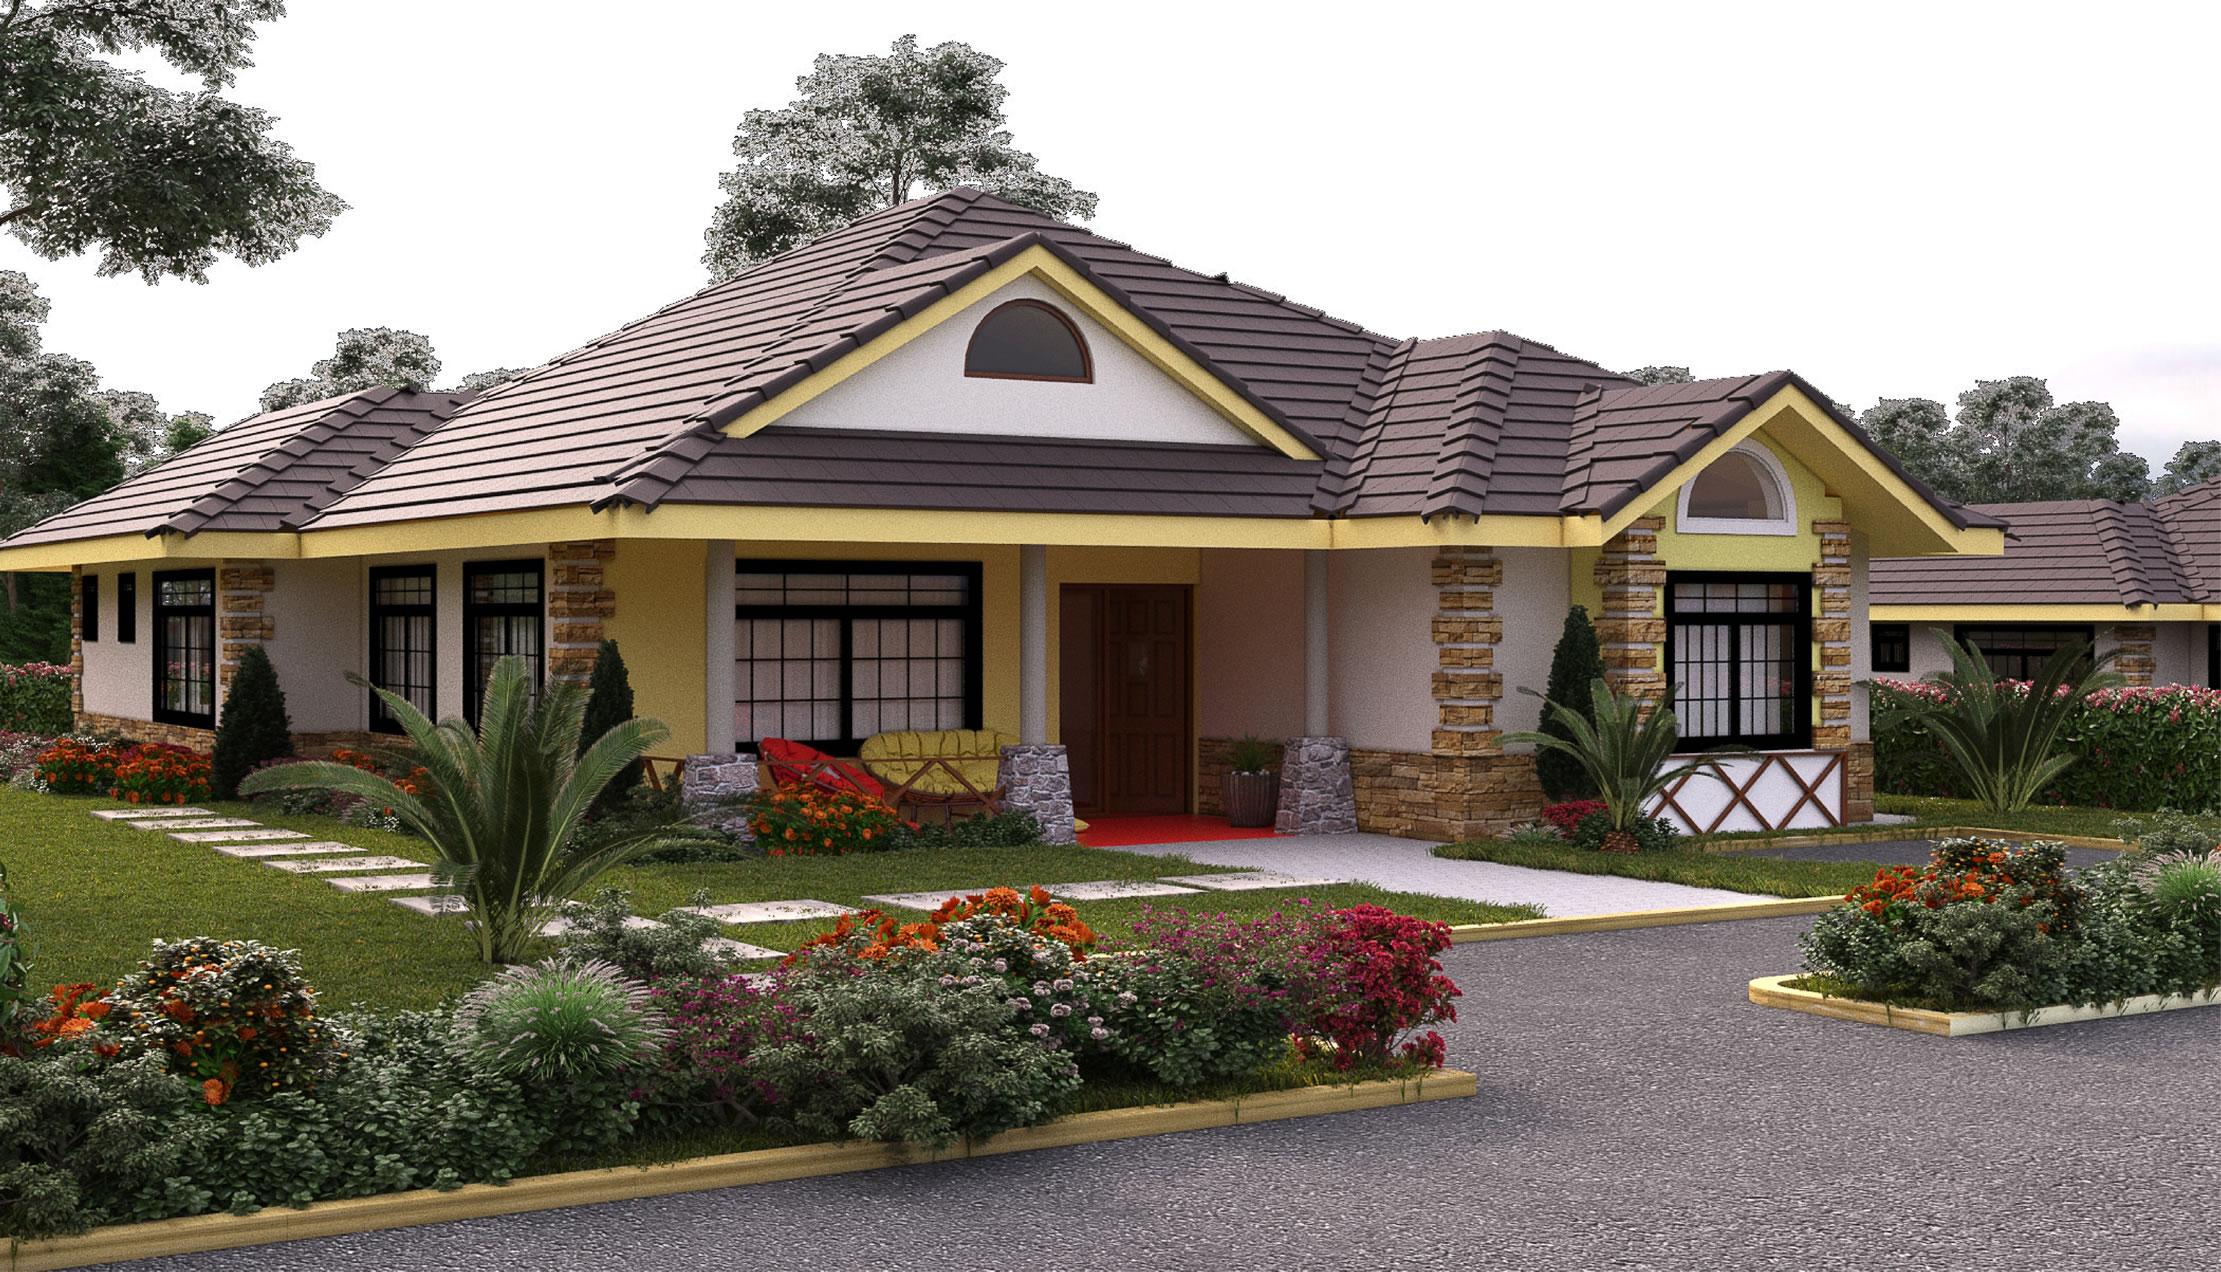 5 Bedroom Bungalow House Plans In Kenya | www.resnooze.com